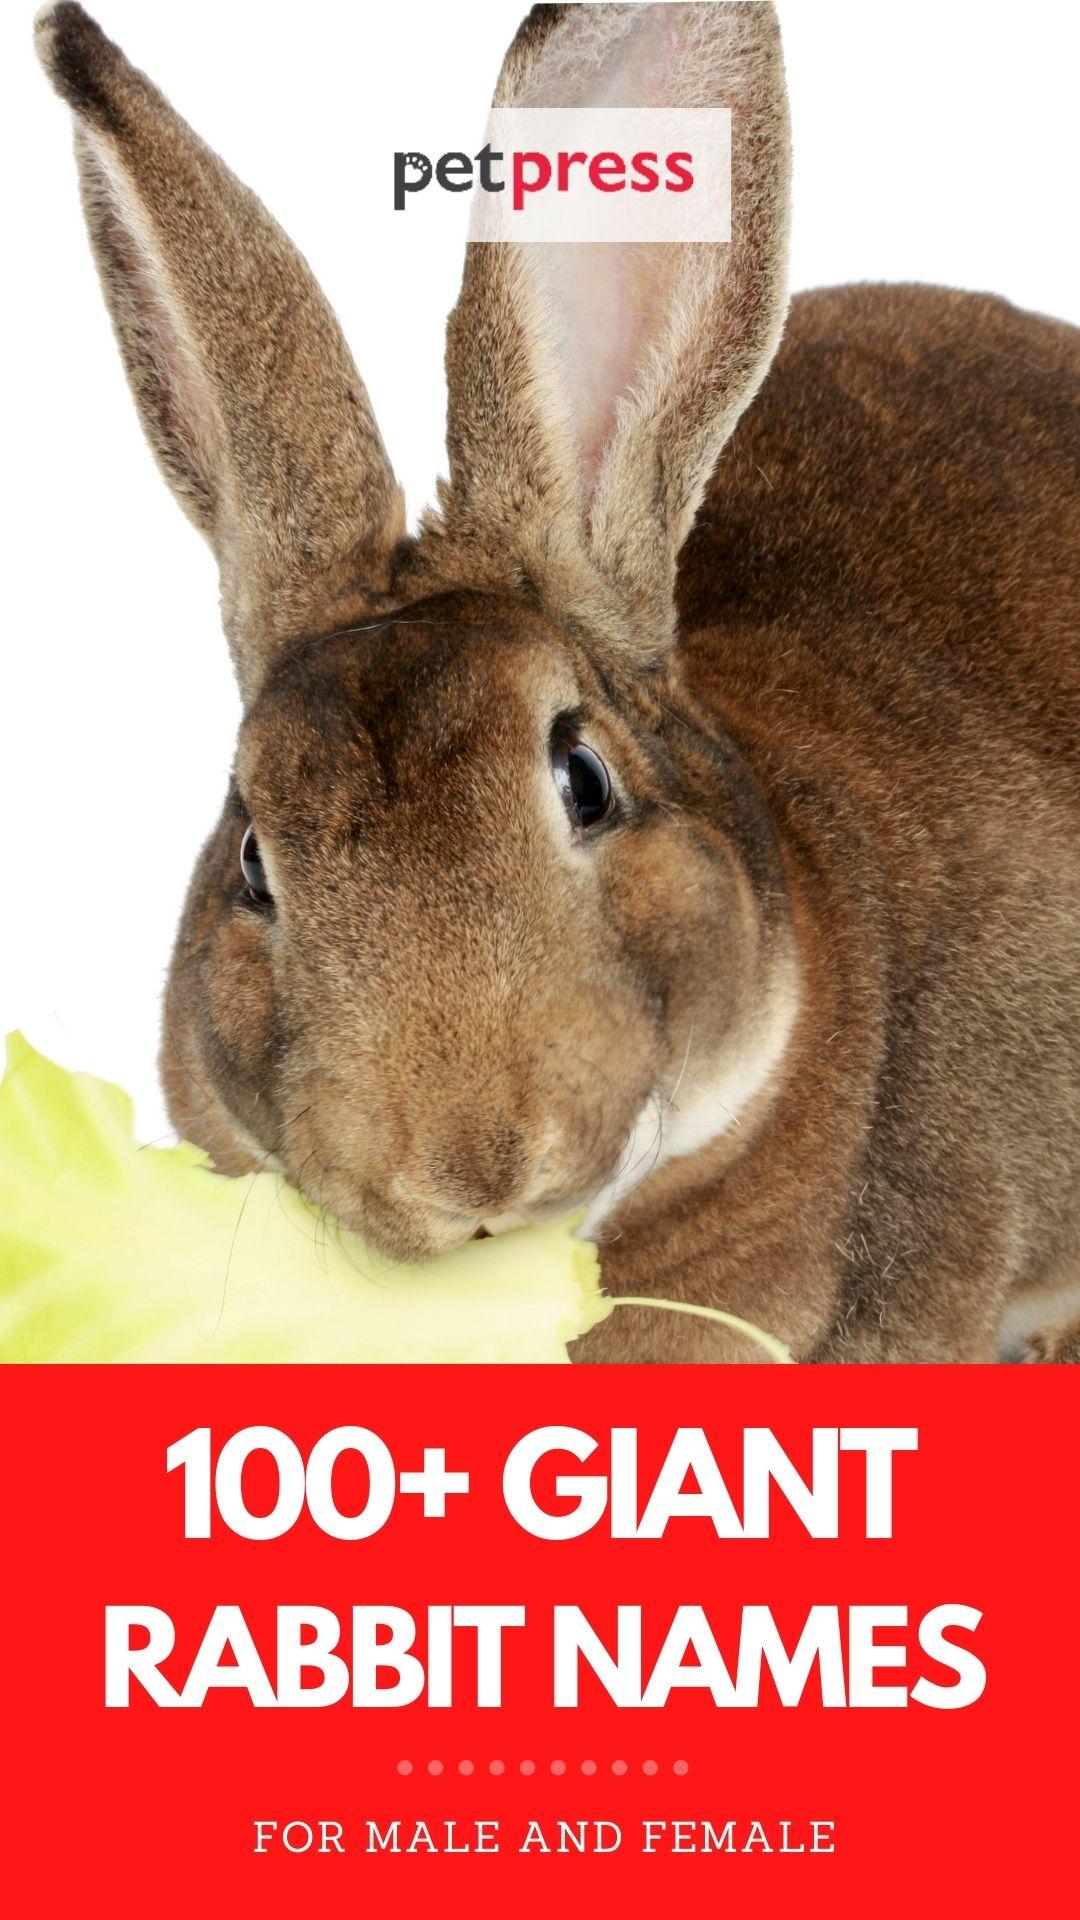 giant rabbit names